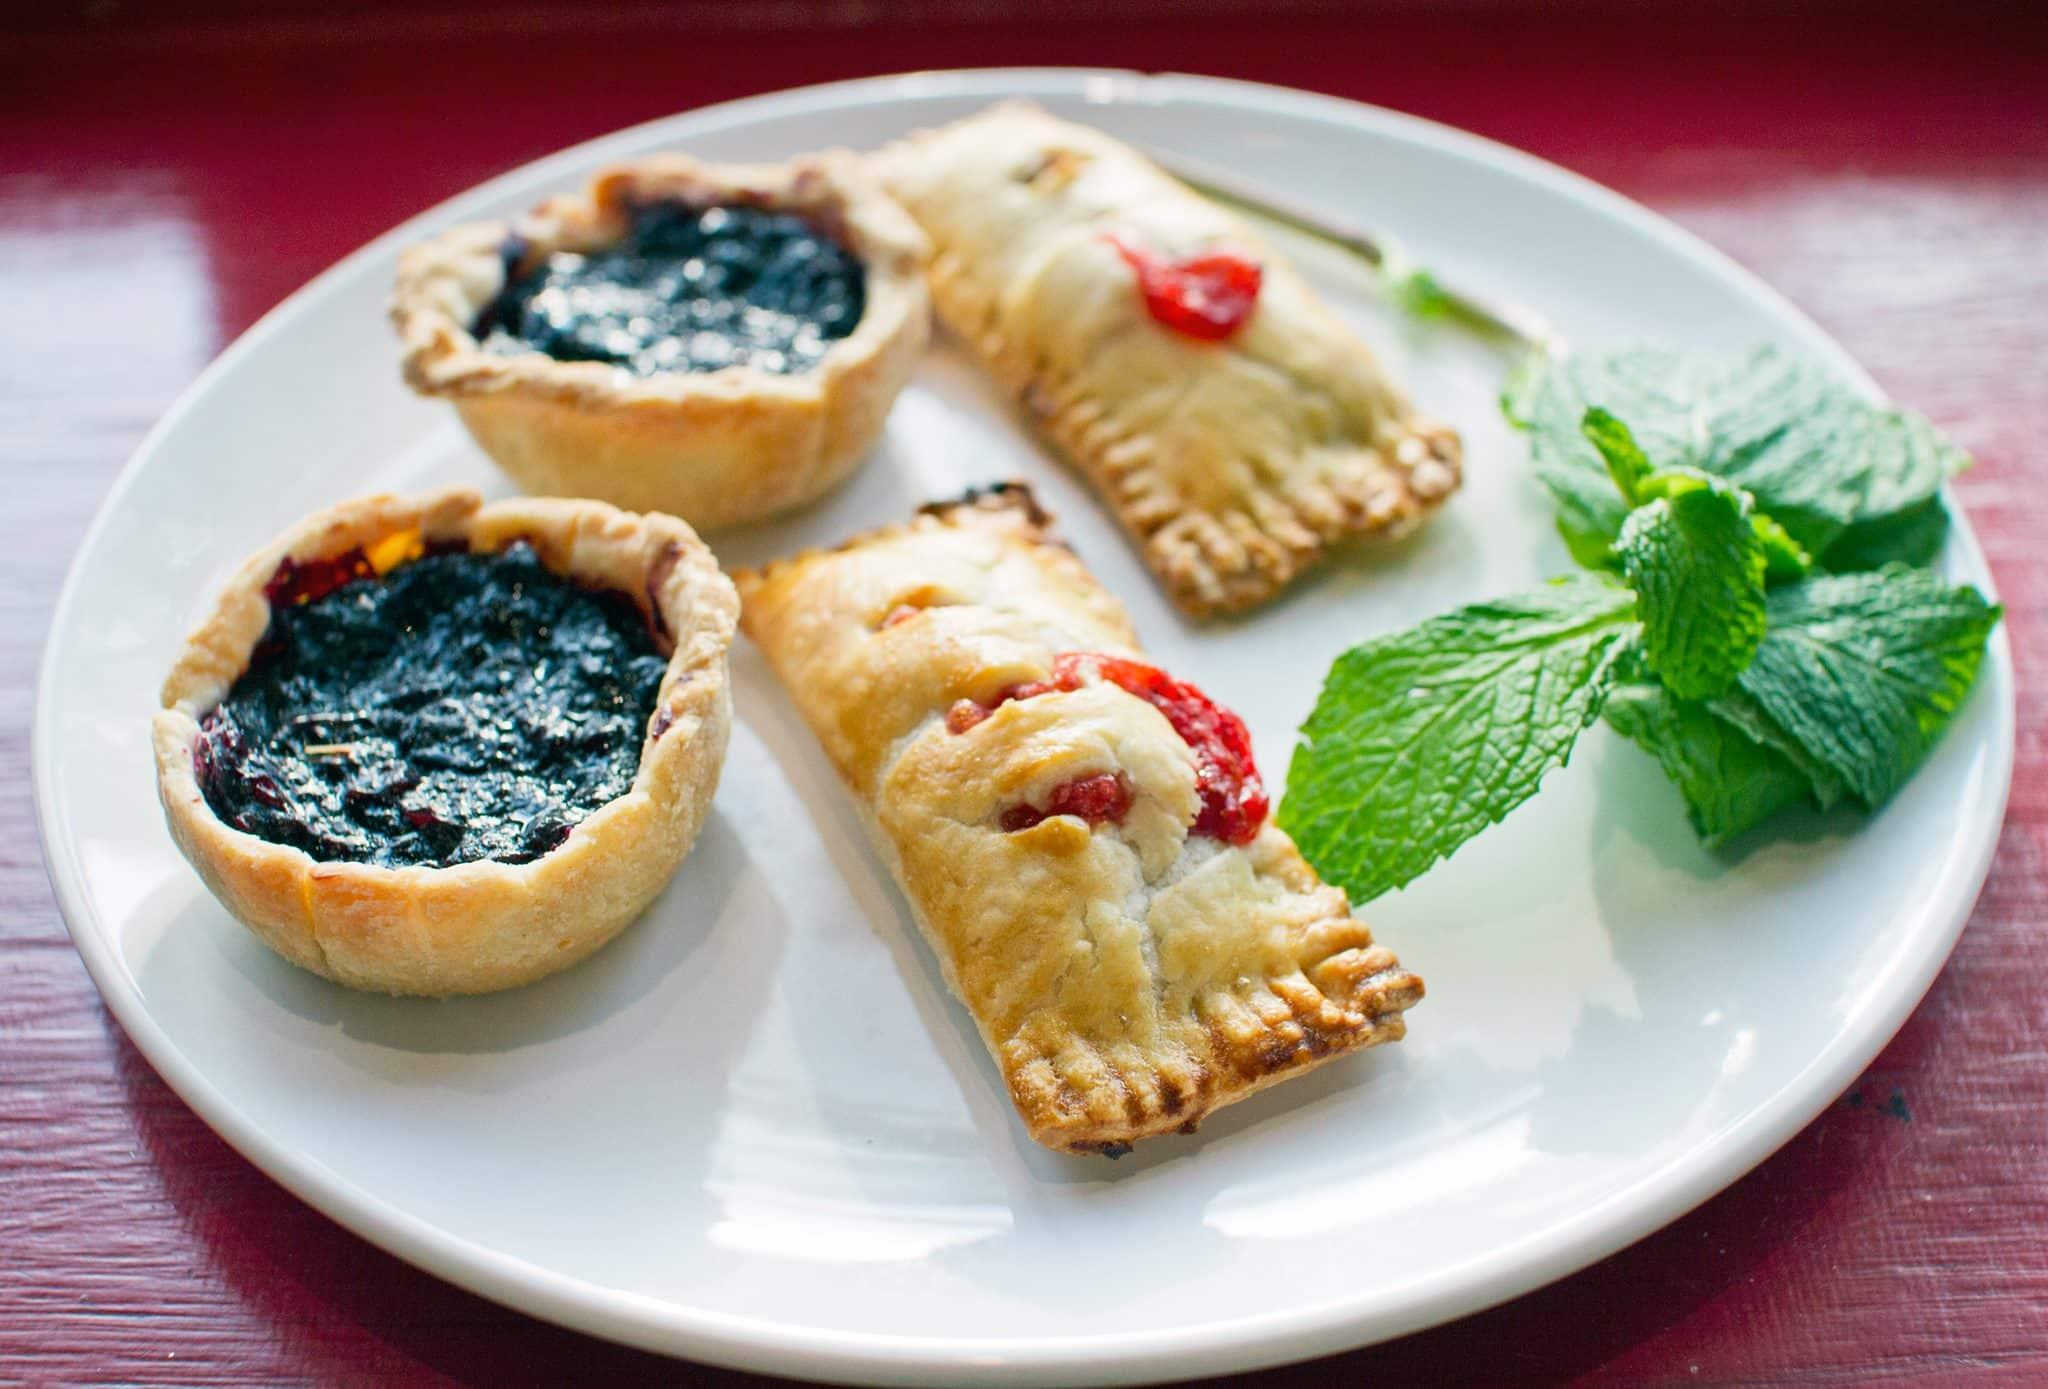 67-biltmore-desserts